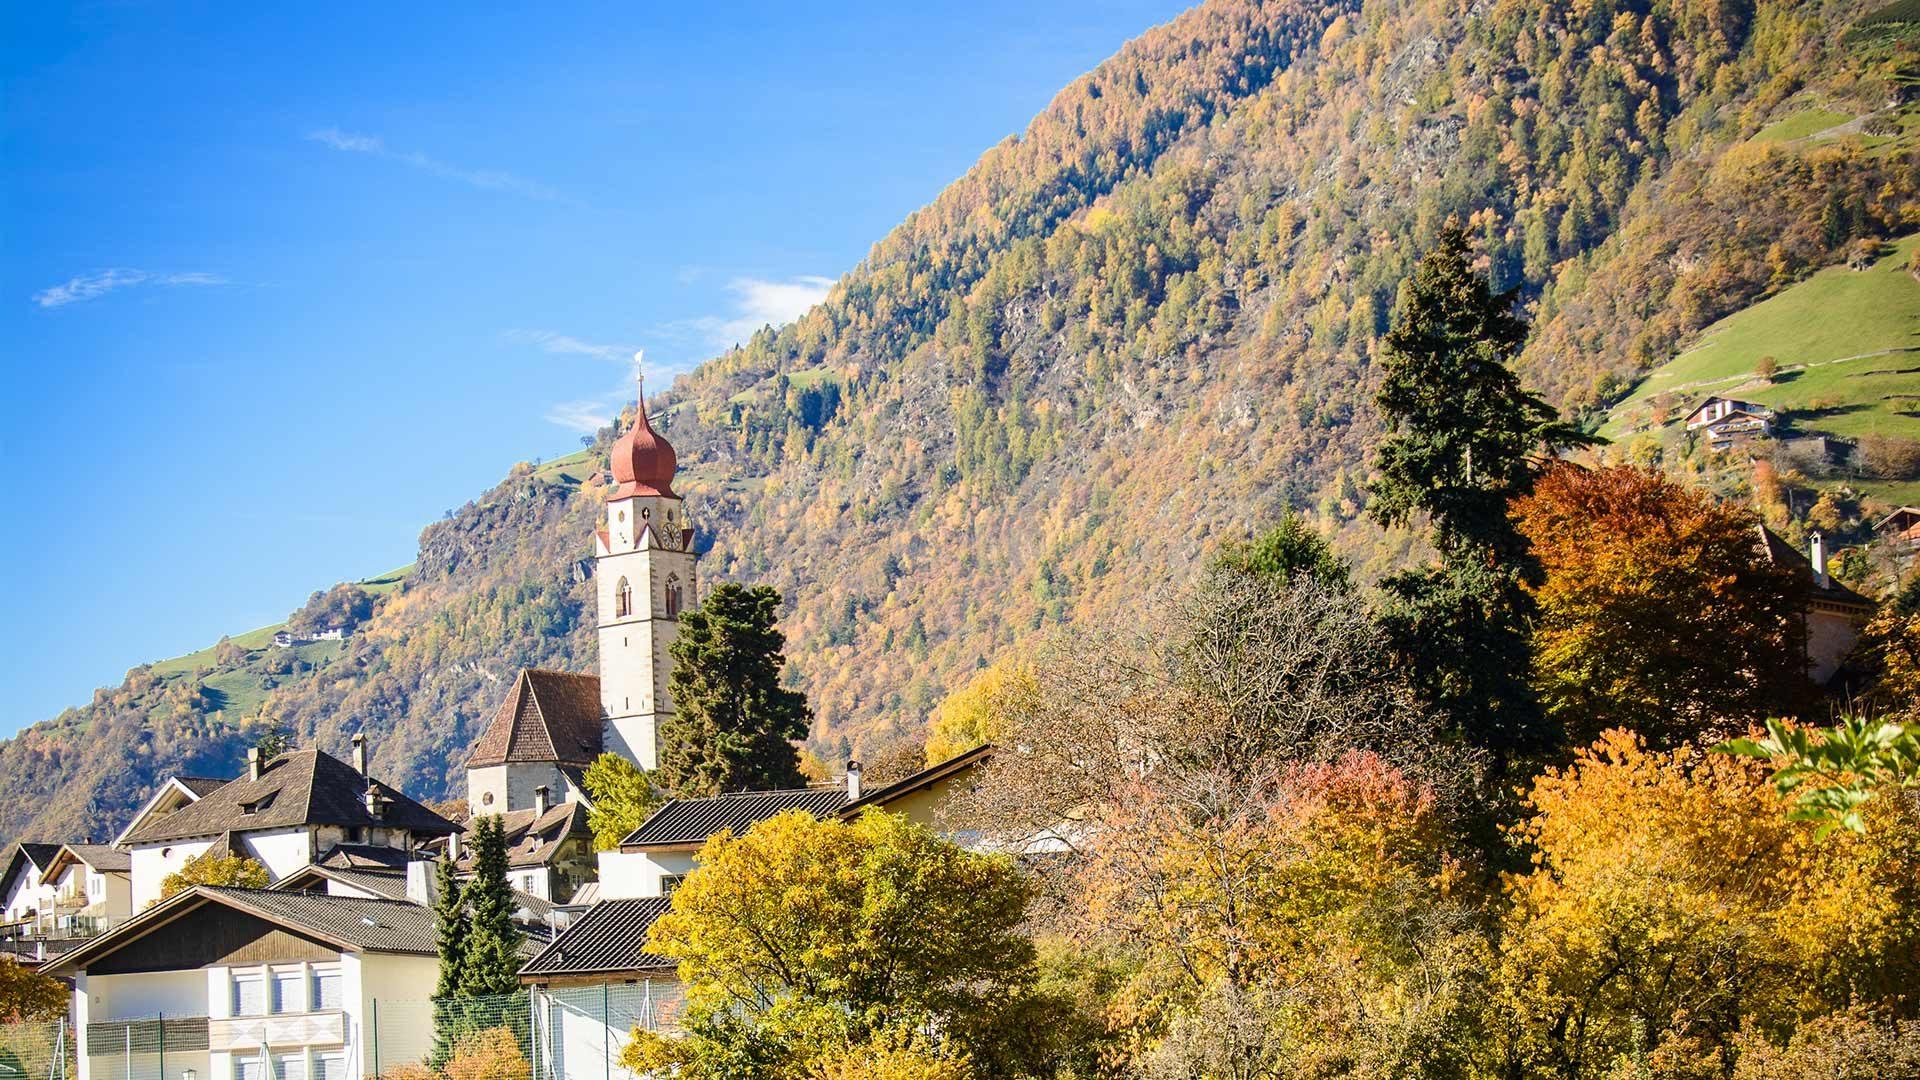 Chiesa di Parcines